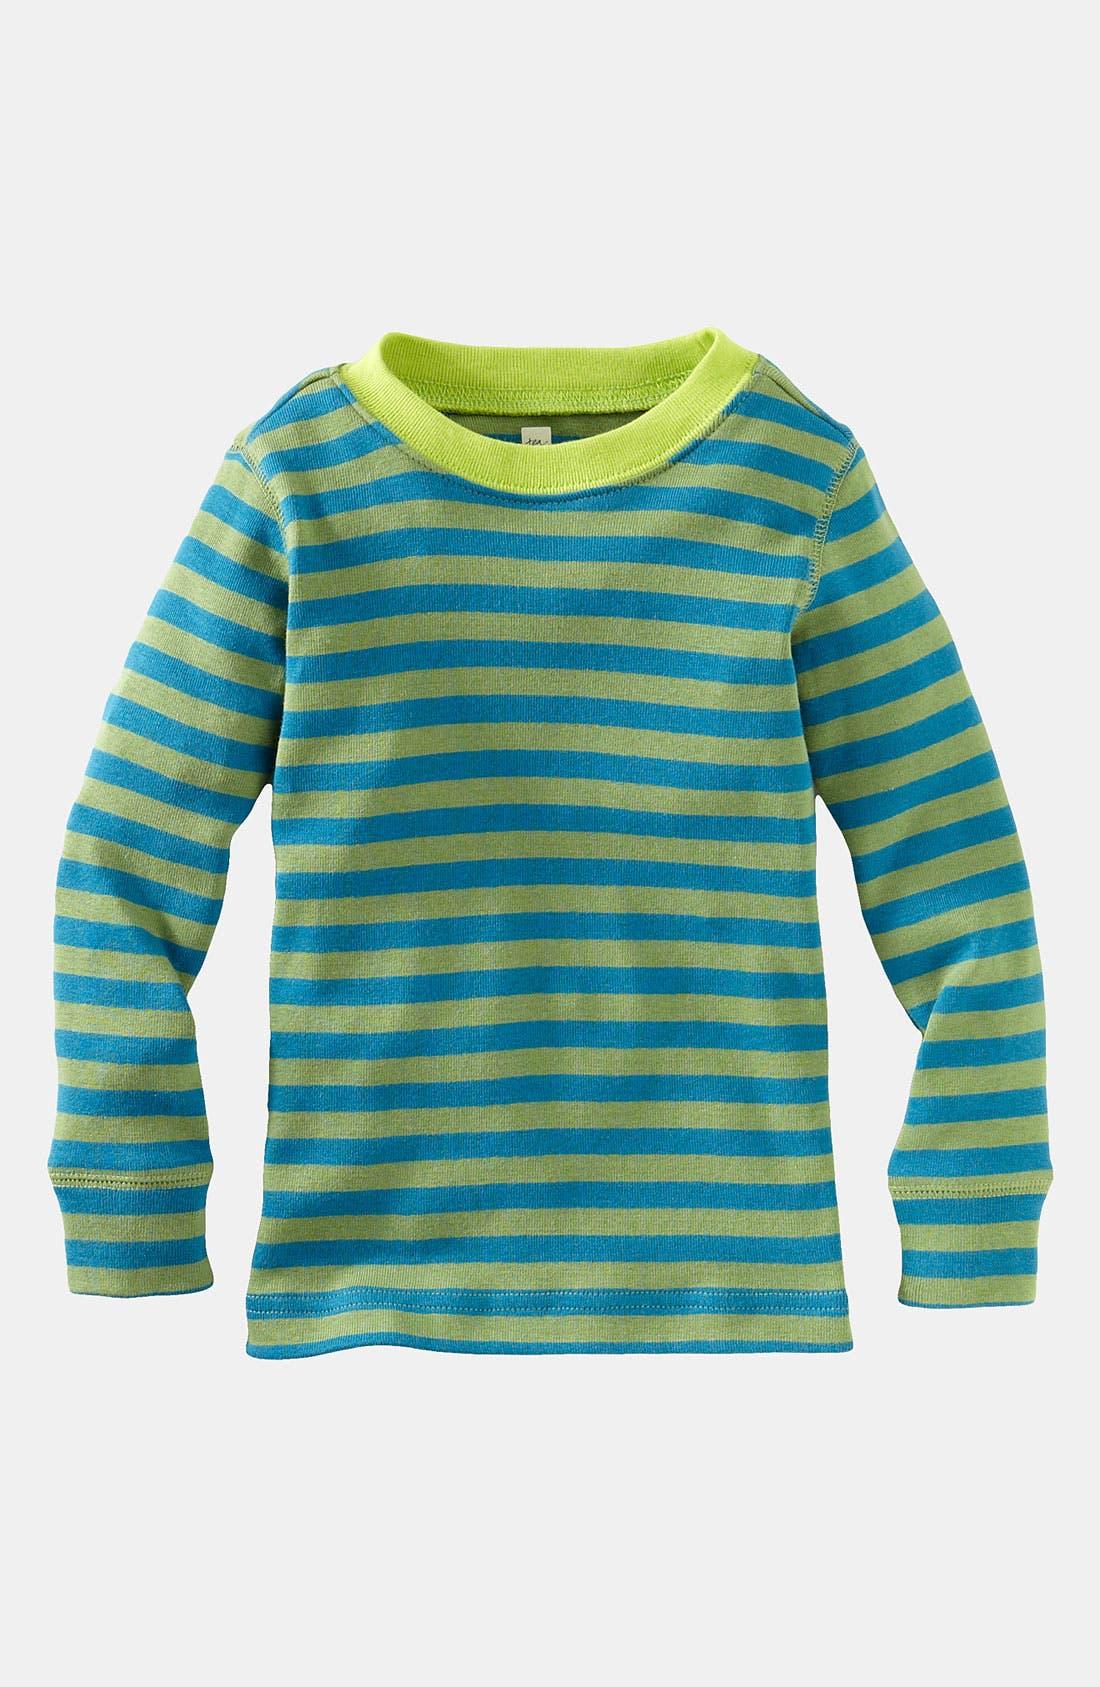 Main Image - Tea Collection Stripe T-Shirt (Toddler)